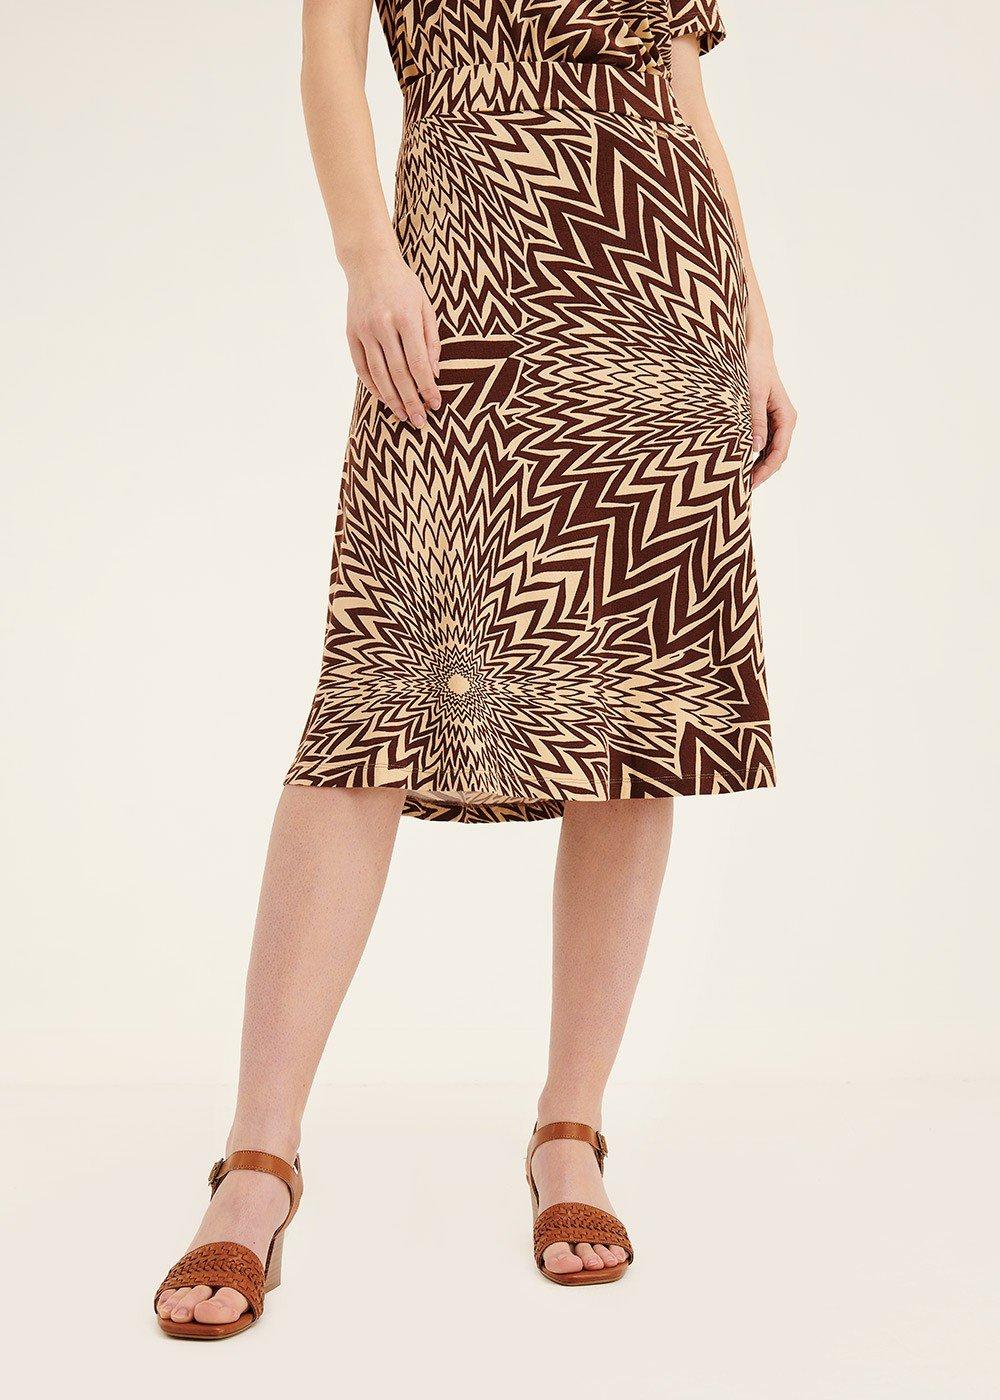 Gaby skirt with optical pattern - Safari / Cacao Fantasia - Woman